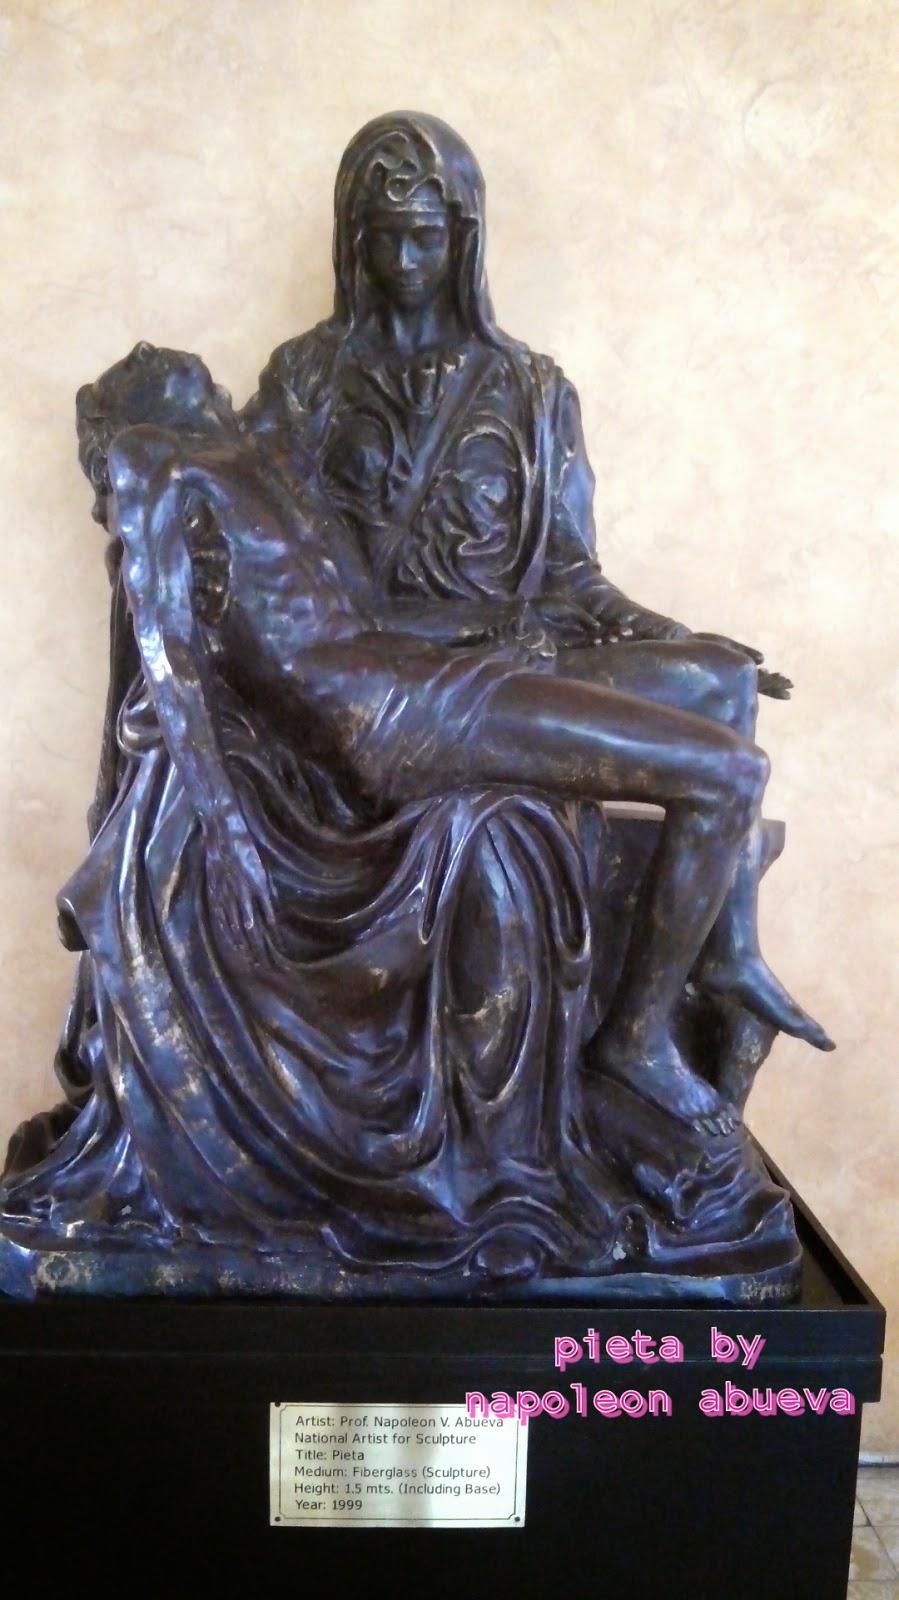 Pieta by Napoleon Abueva